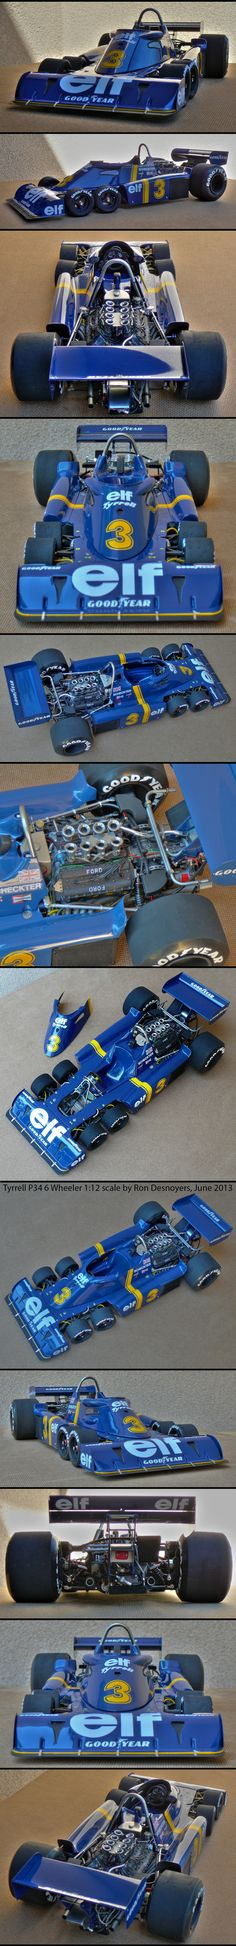 Tyrrell P34 6 Wheeler 1:12 Scale Tamiya model by *Autographix on deviantART